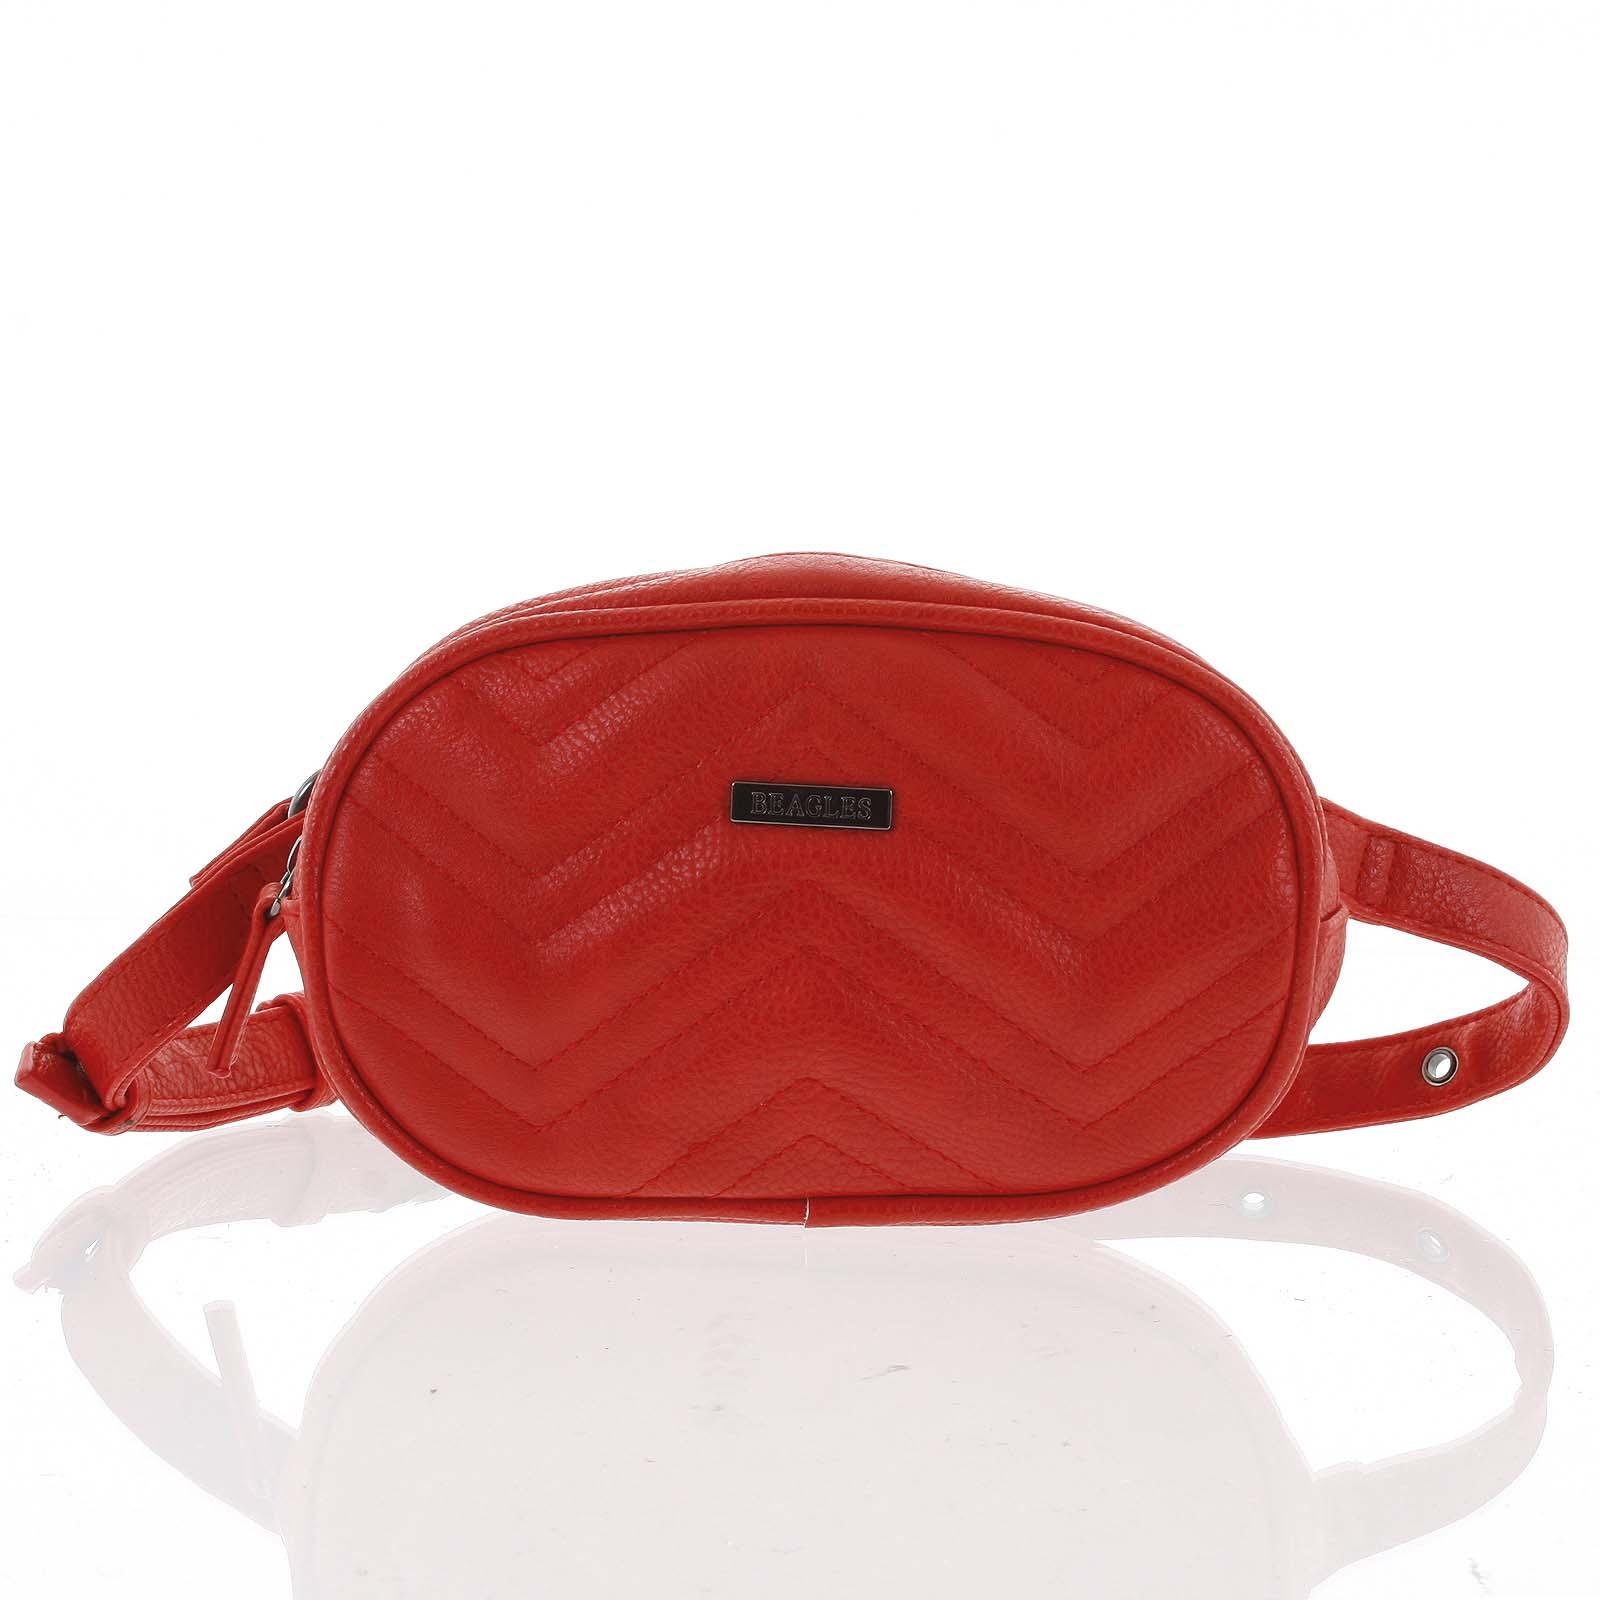 Malá dámska crossbody kabelka / ľadvinka červená - Beagles Tima